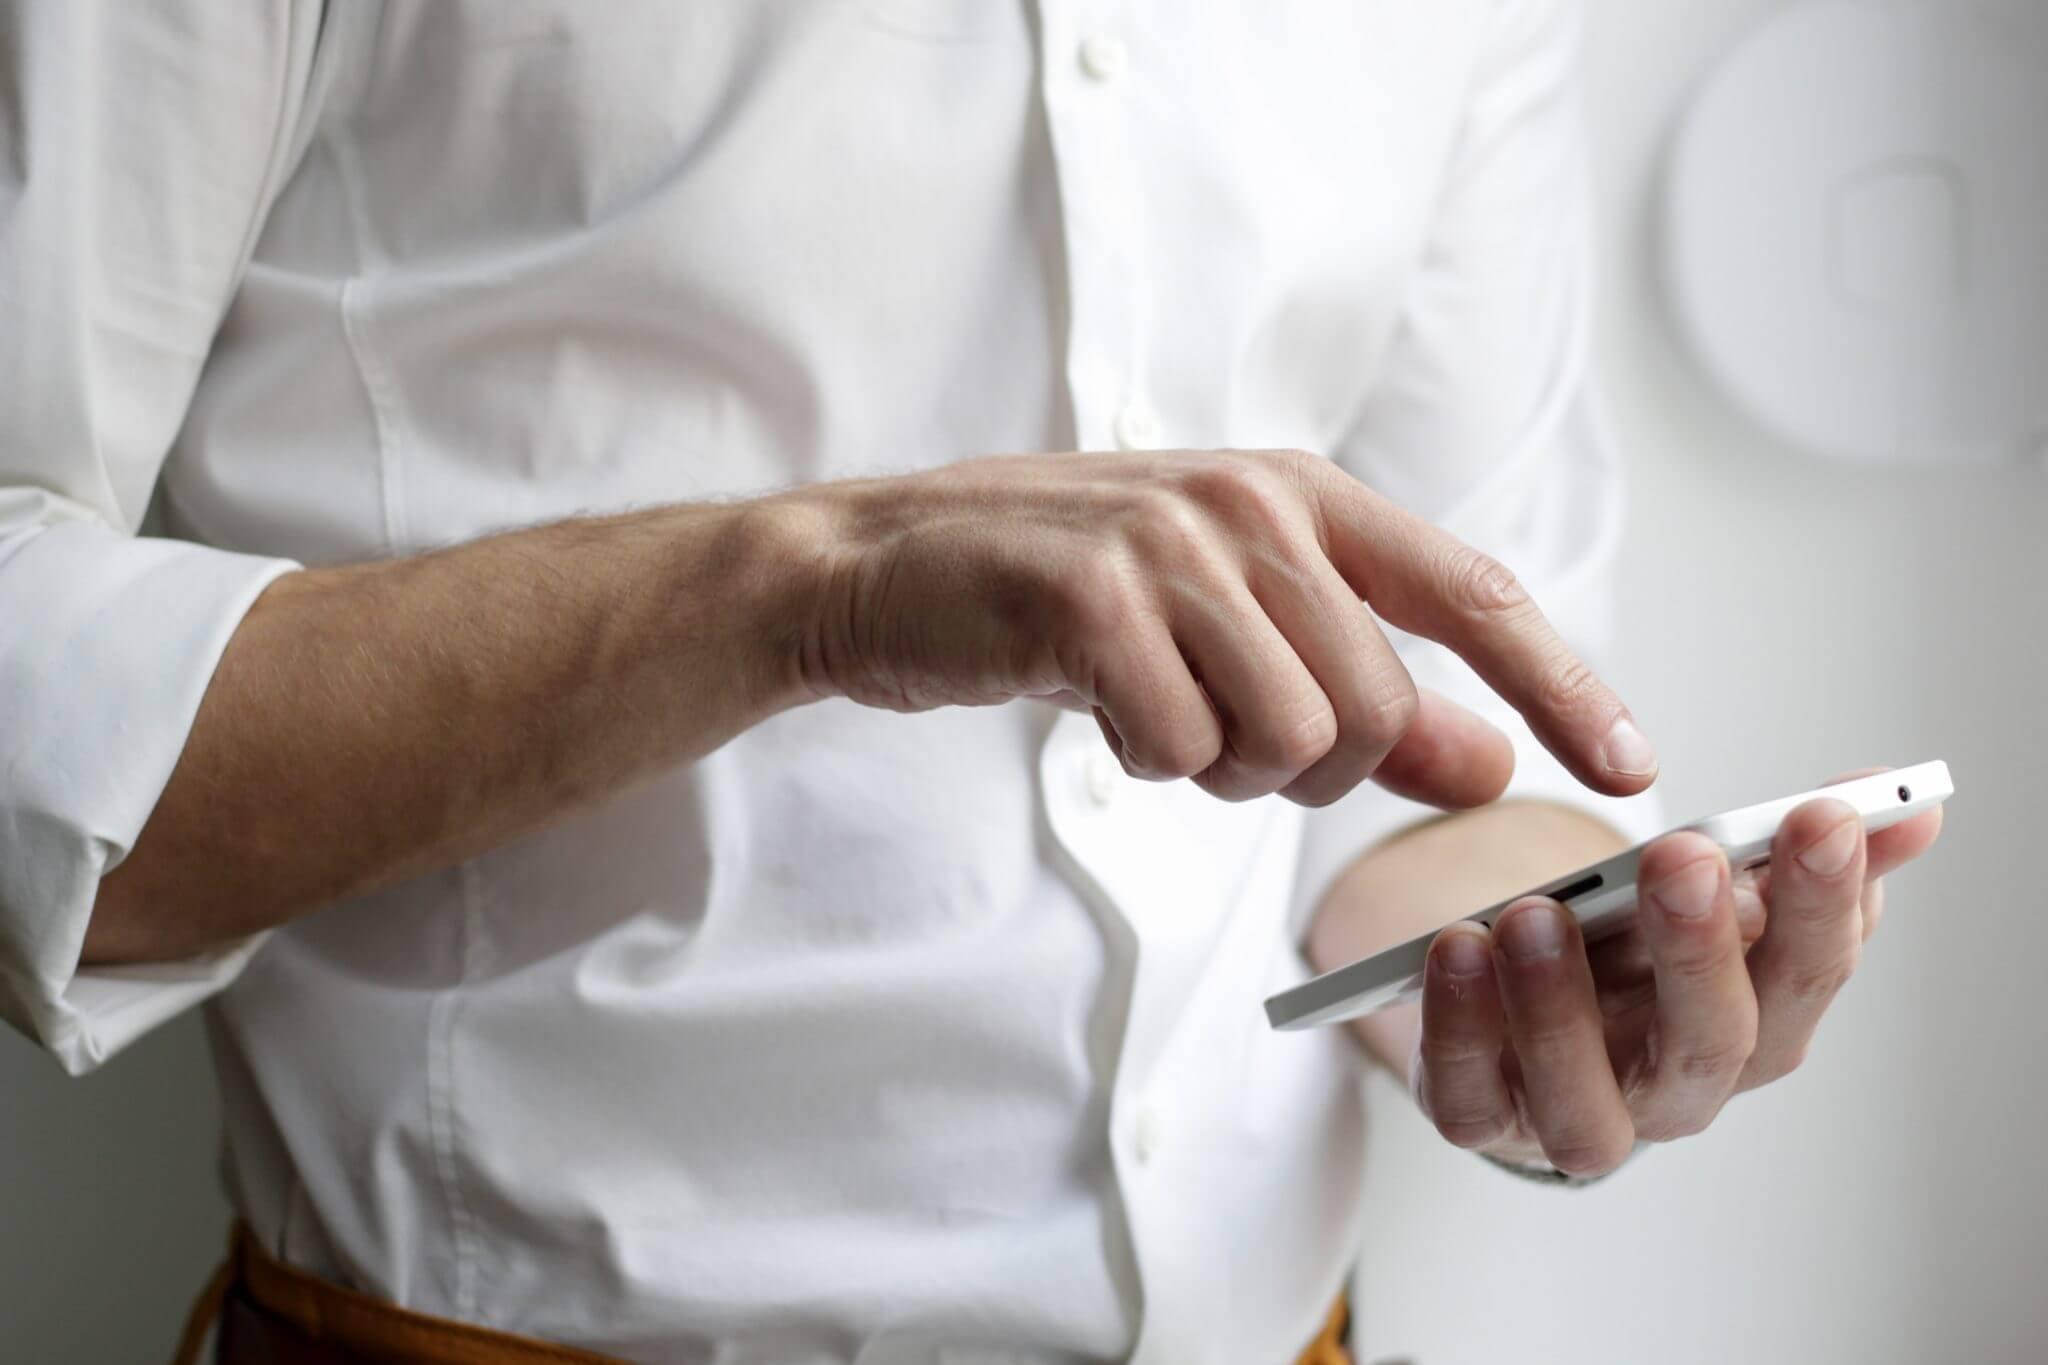 fingers on phone